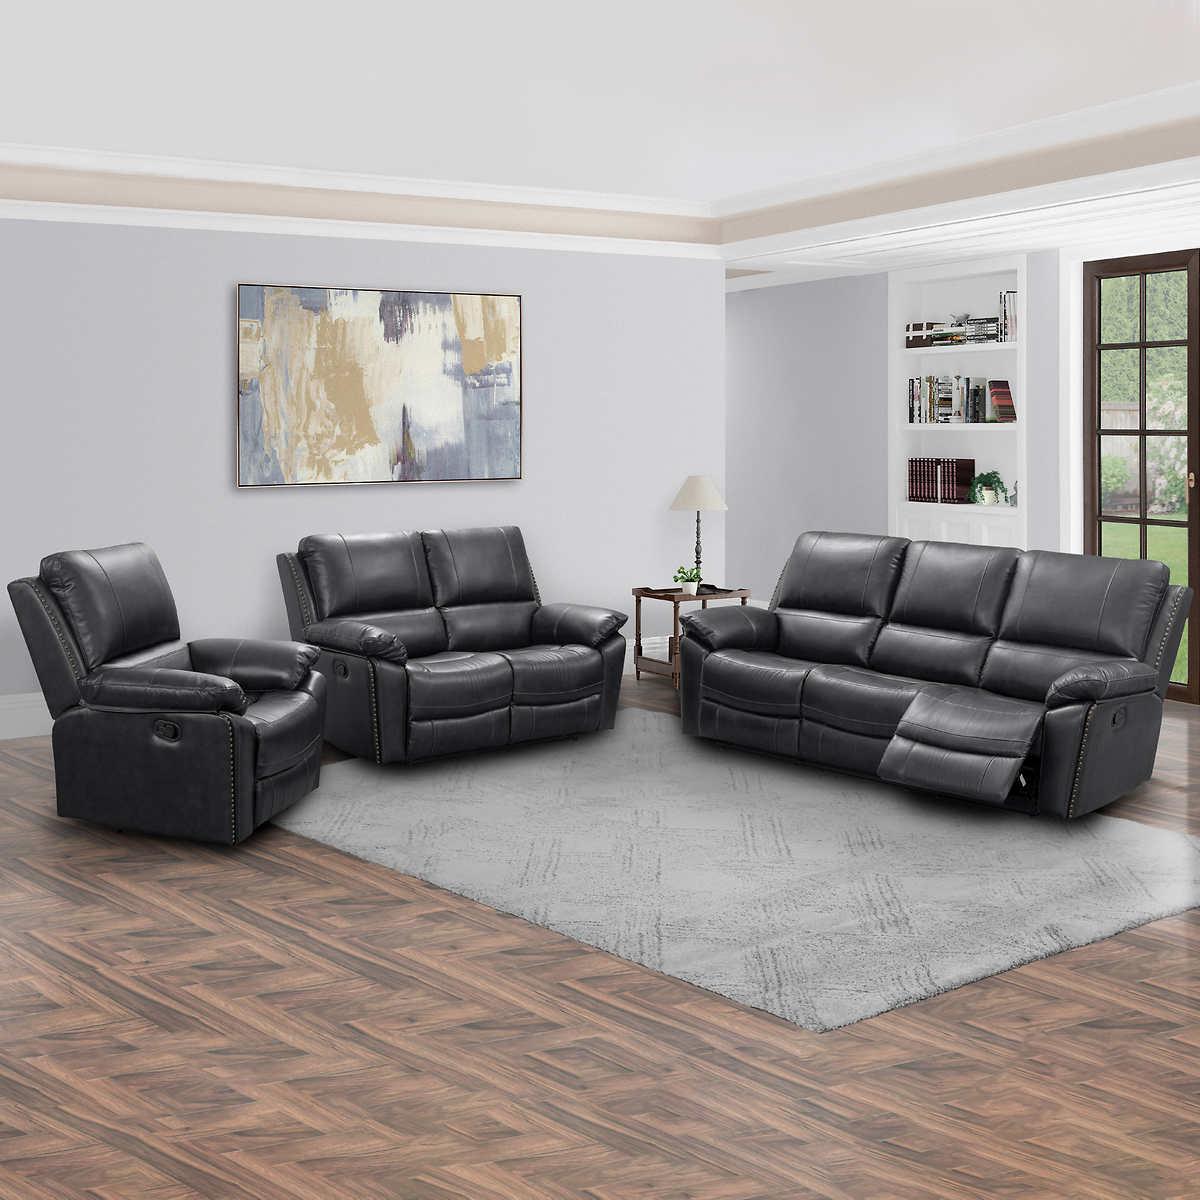 Soldano 3 Piece Leather Reclining Set